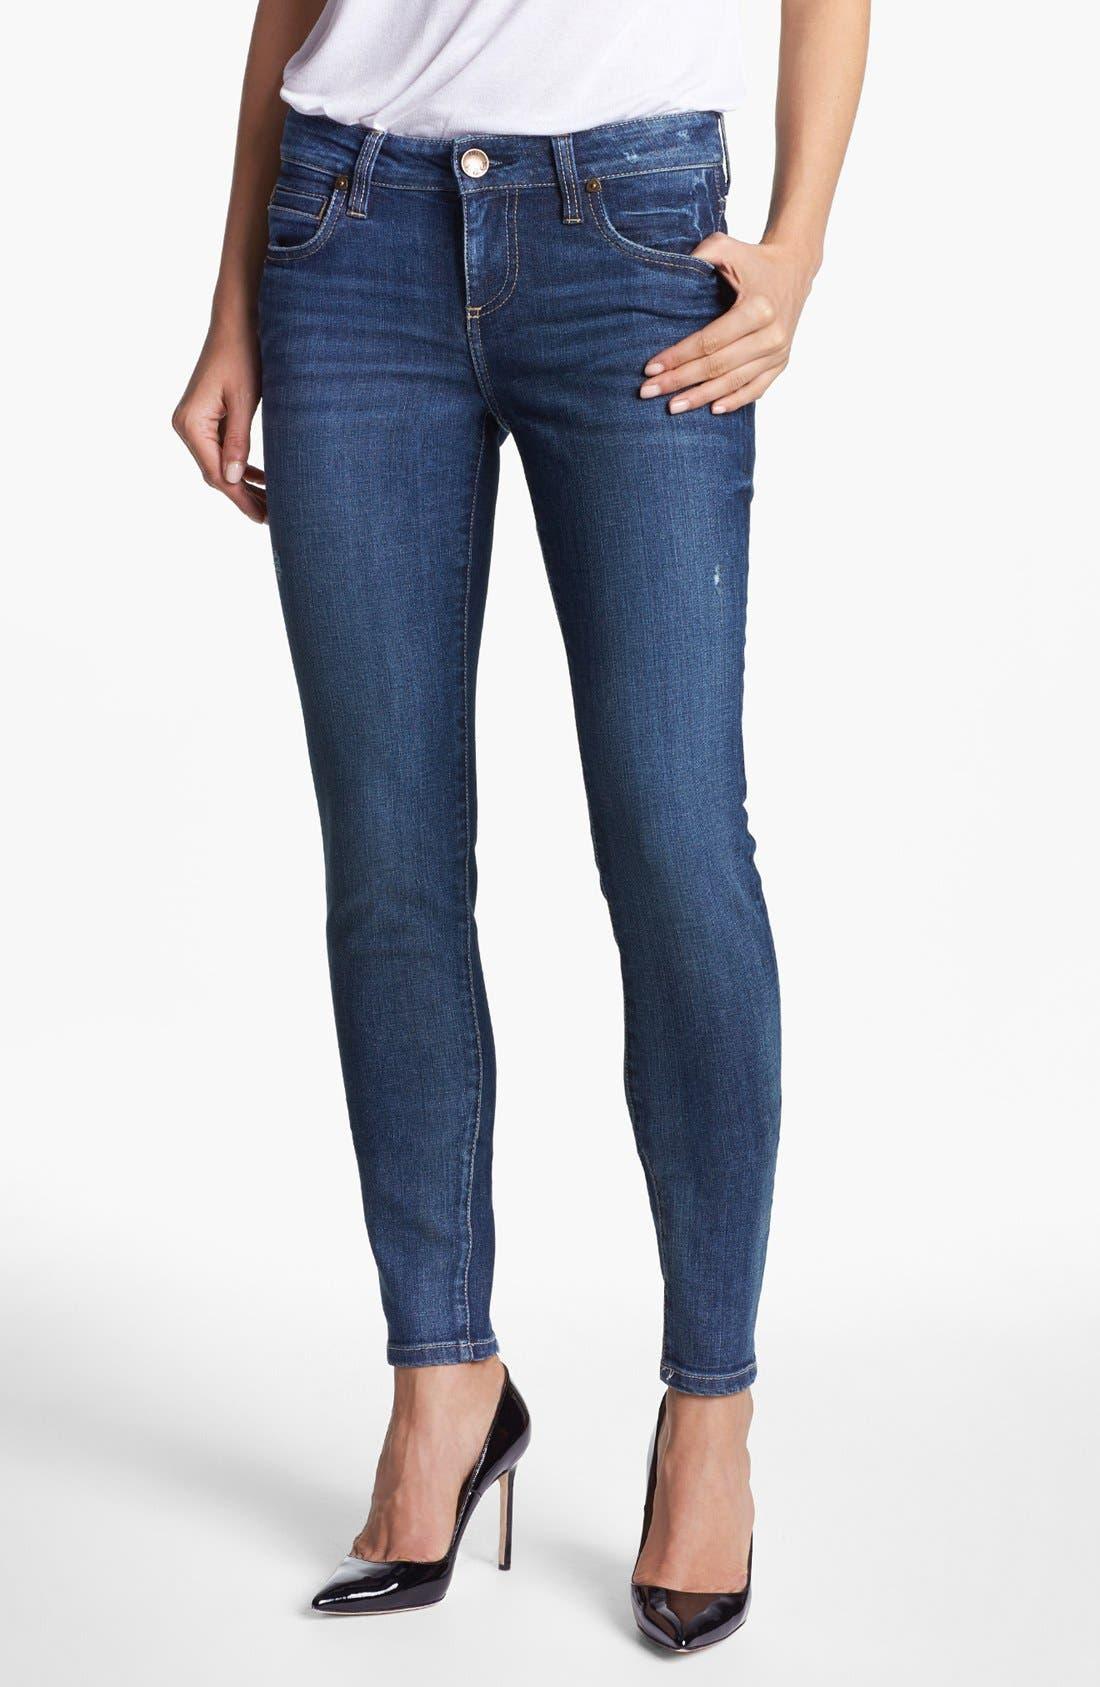 KUT FROM THE KLOTH, 'Mia' Skinny Jeans, Main thumbnail 1, color, 433